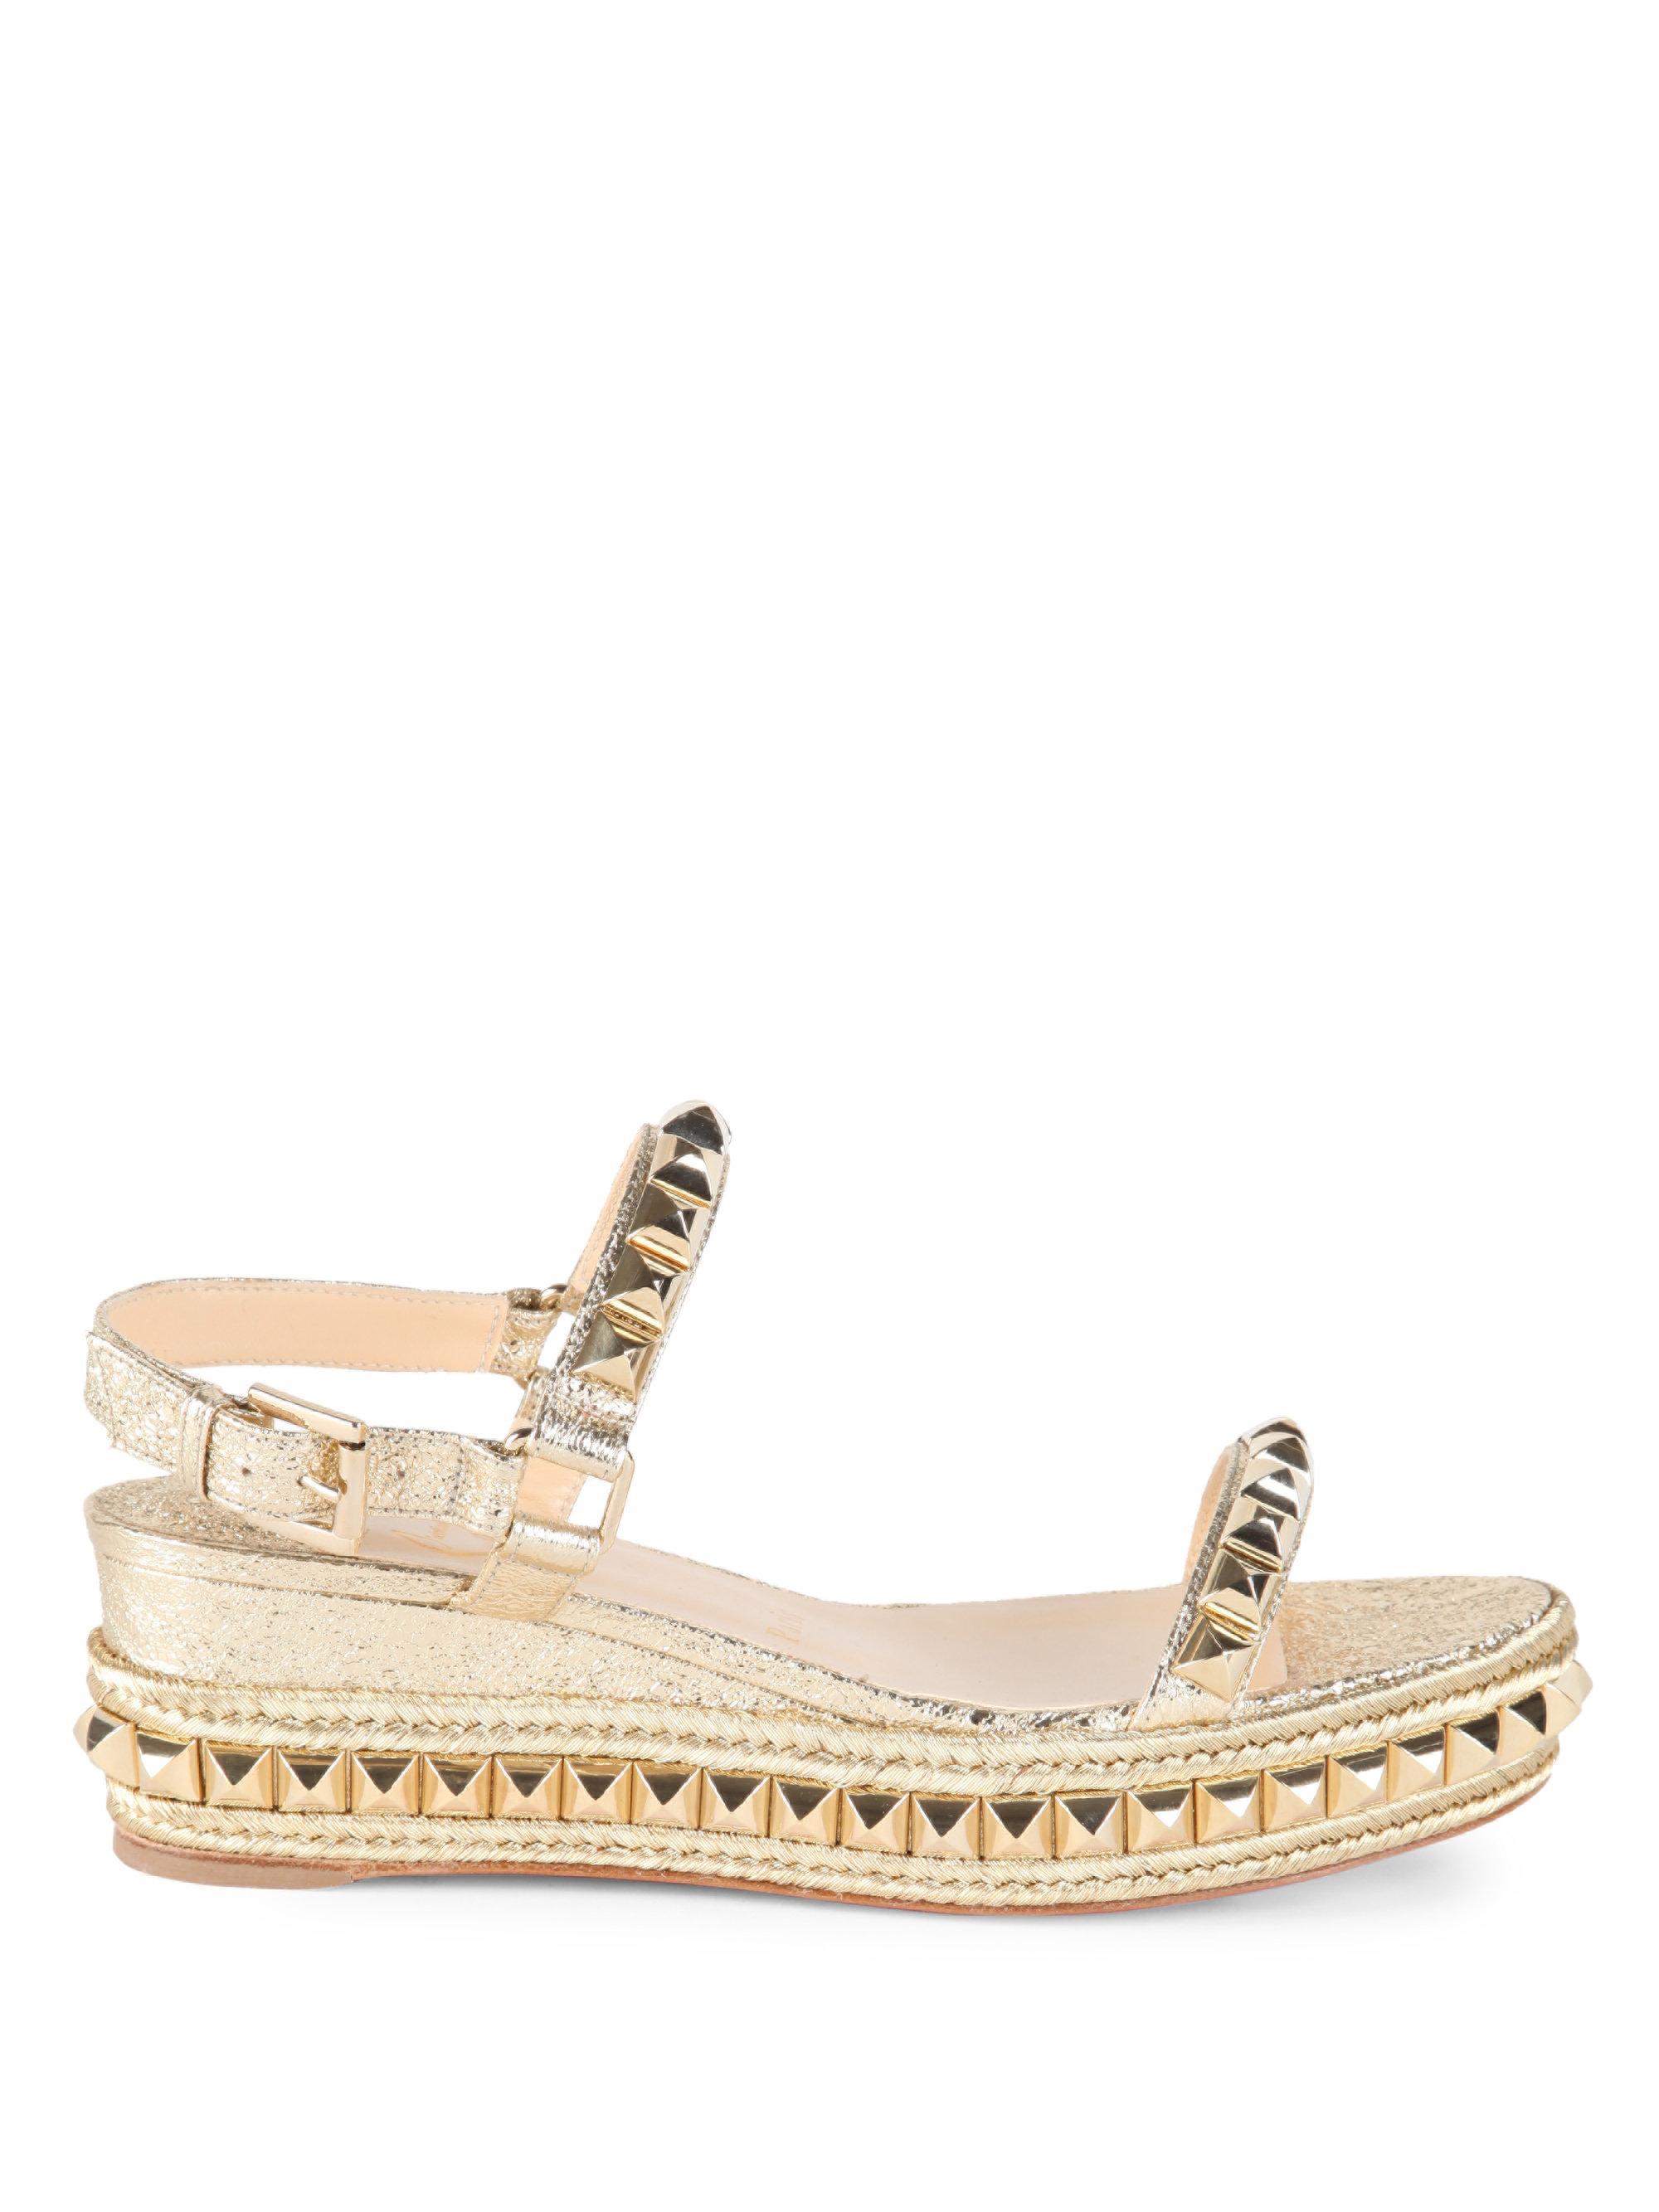 087be5925e1 Christian Louboutin Cataclou 60 Studded Metallic Leather Espadrille Wedge  Sandals